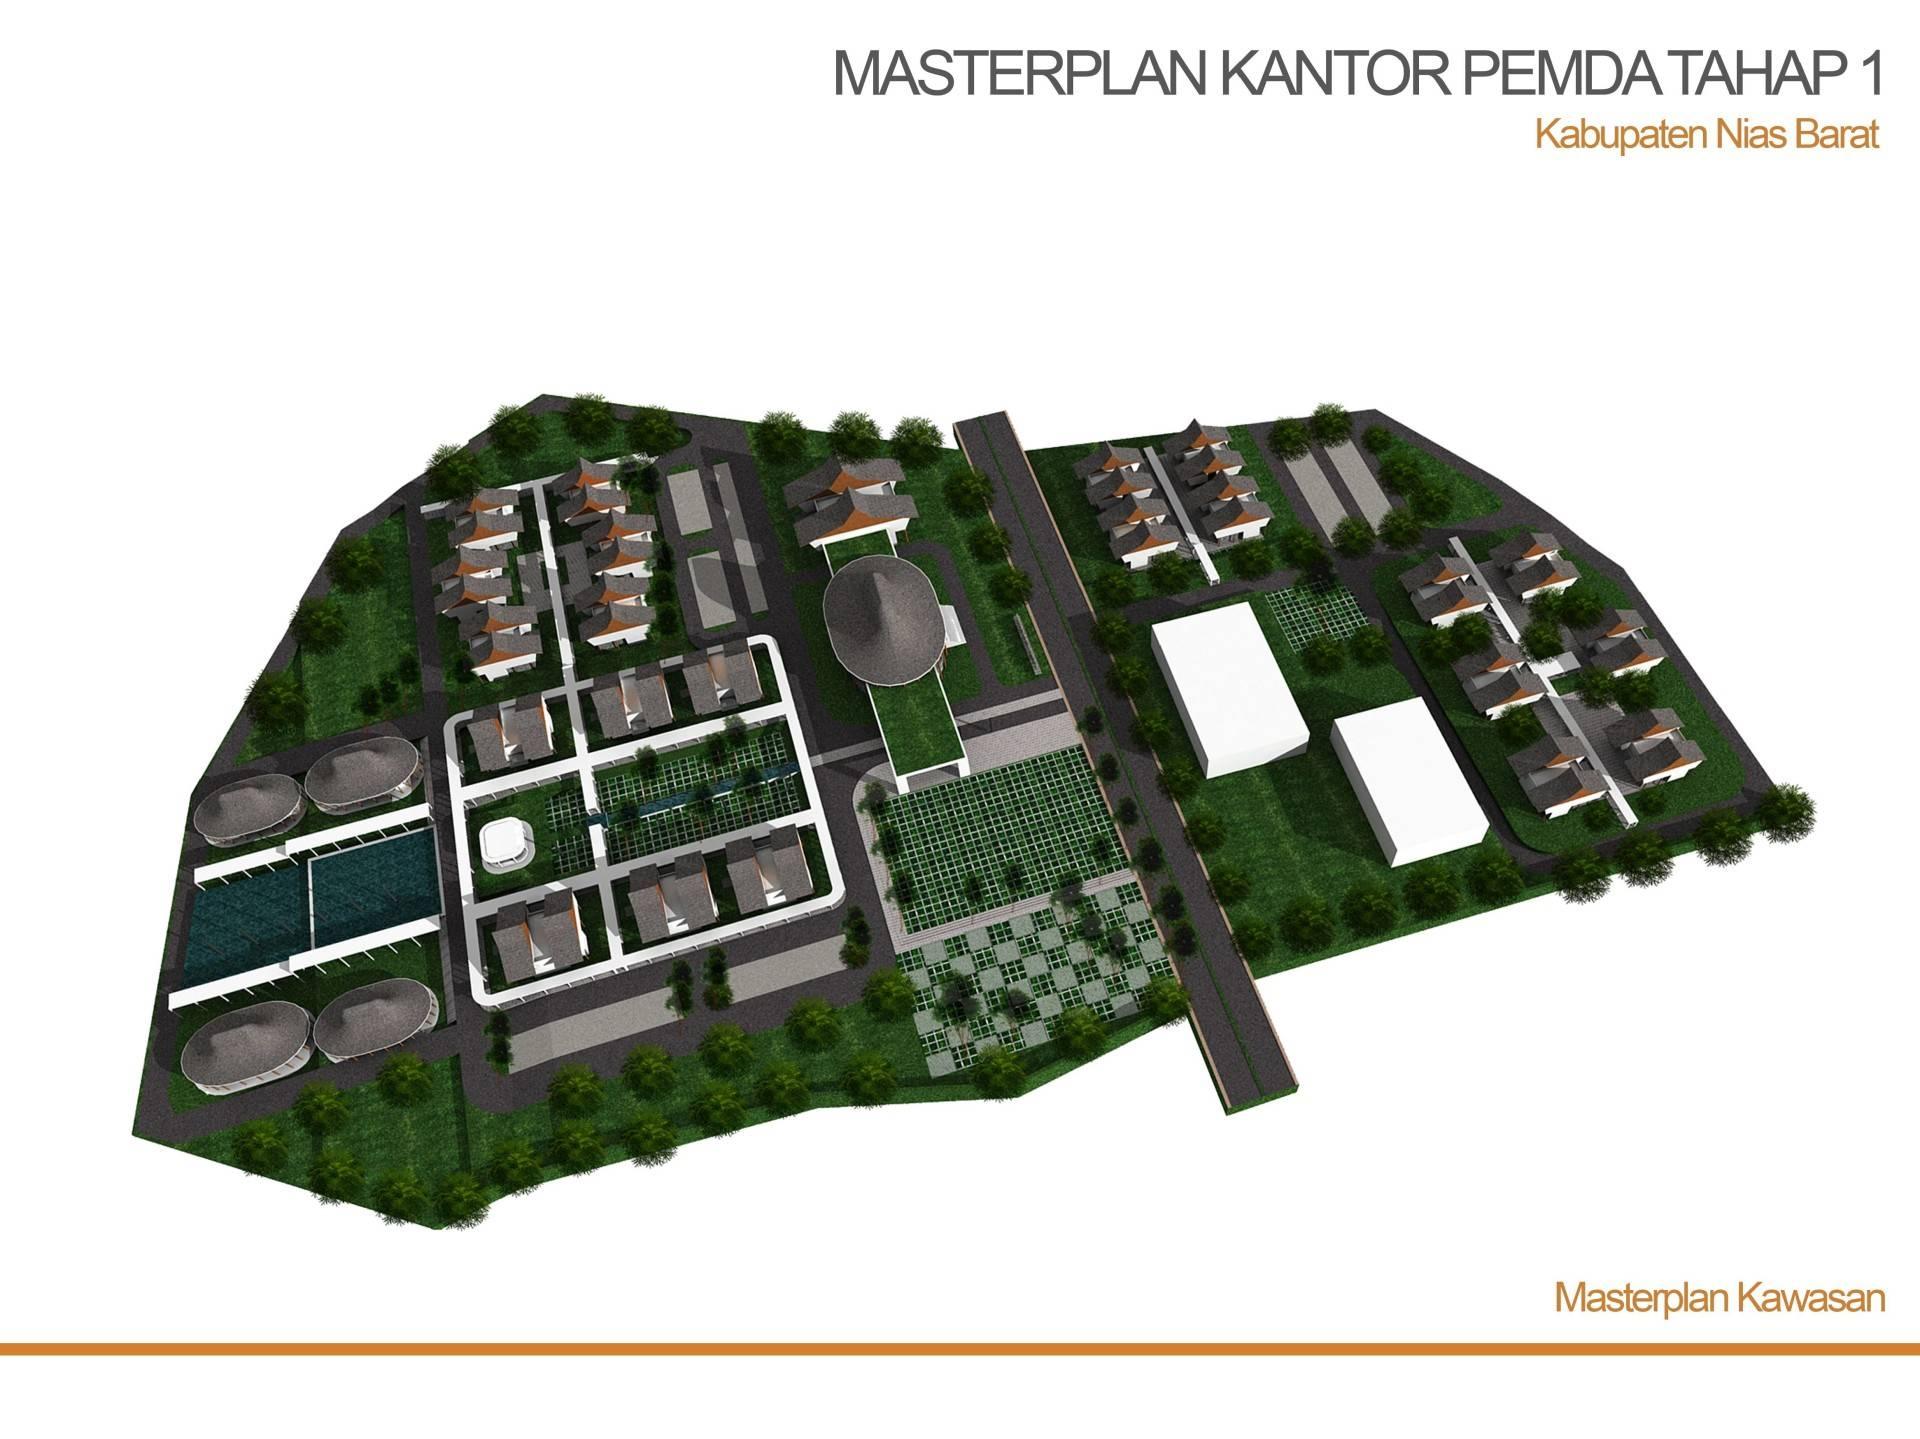 Pt. Daa Interplan Indonesia Masterplan Dprd Nias Barat Kabupaten Nias Barat Kabupaten Nias Barat Masterplan-Dprd-Nias-Barat   7244